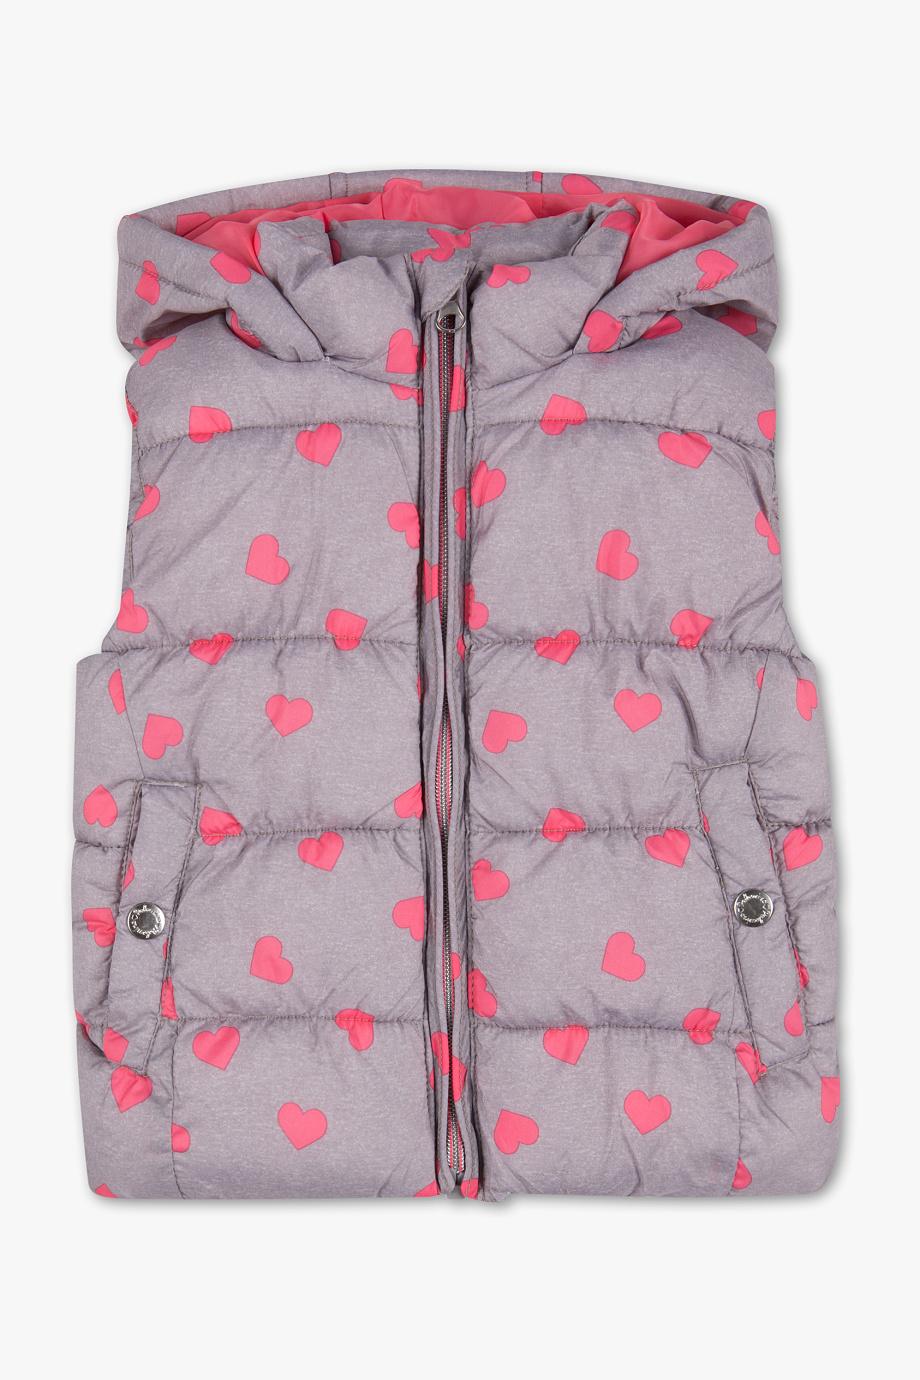 Steppweste in grau mit rosa Herzen